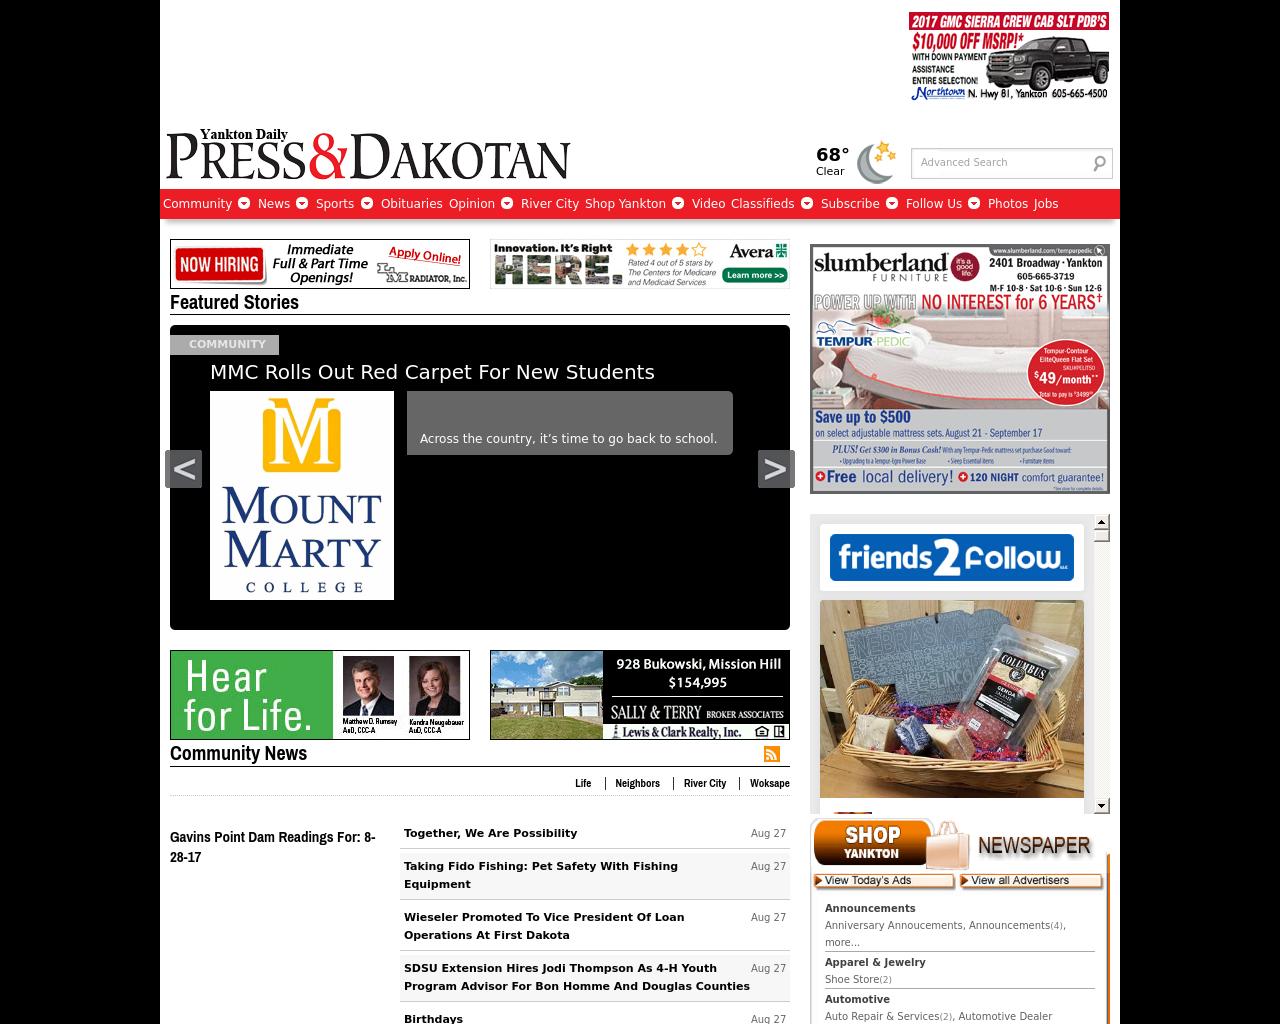 Yankton-Daily-Press-&-Dakotan-Advertising-Reviews-Pricing